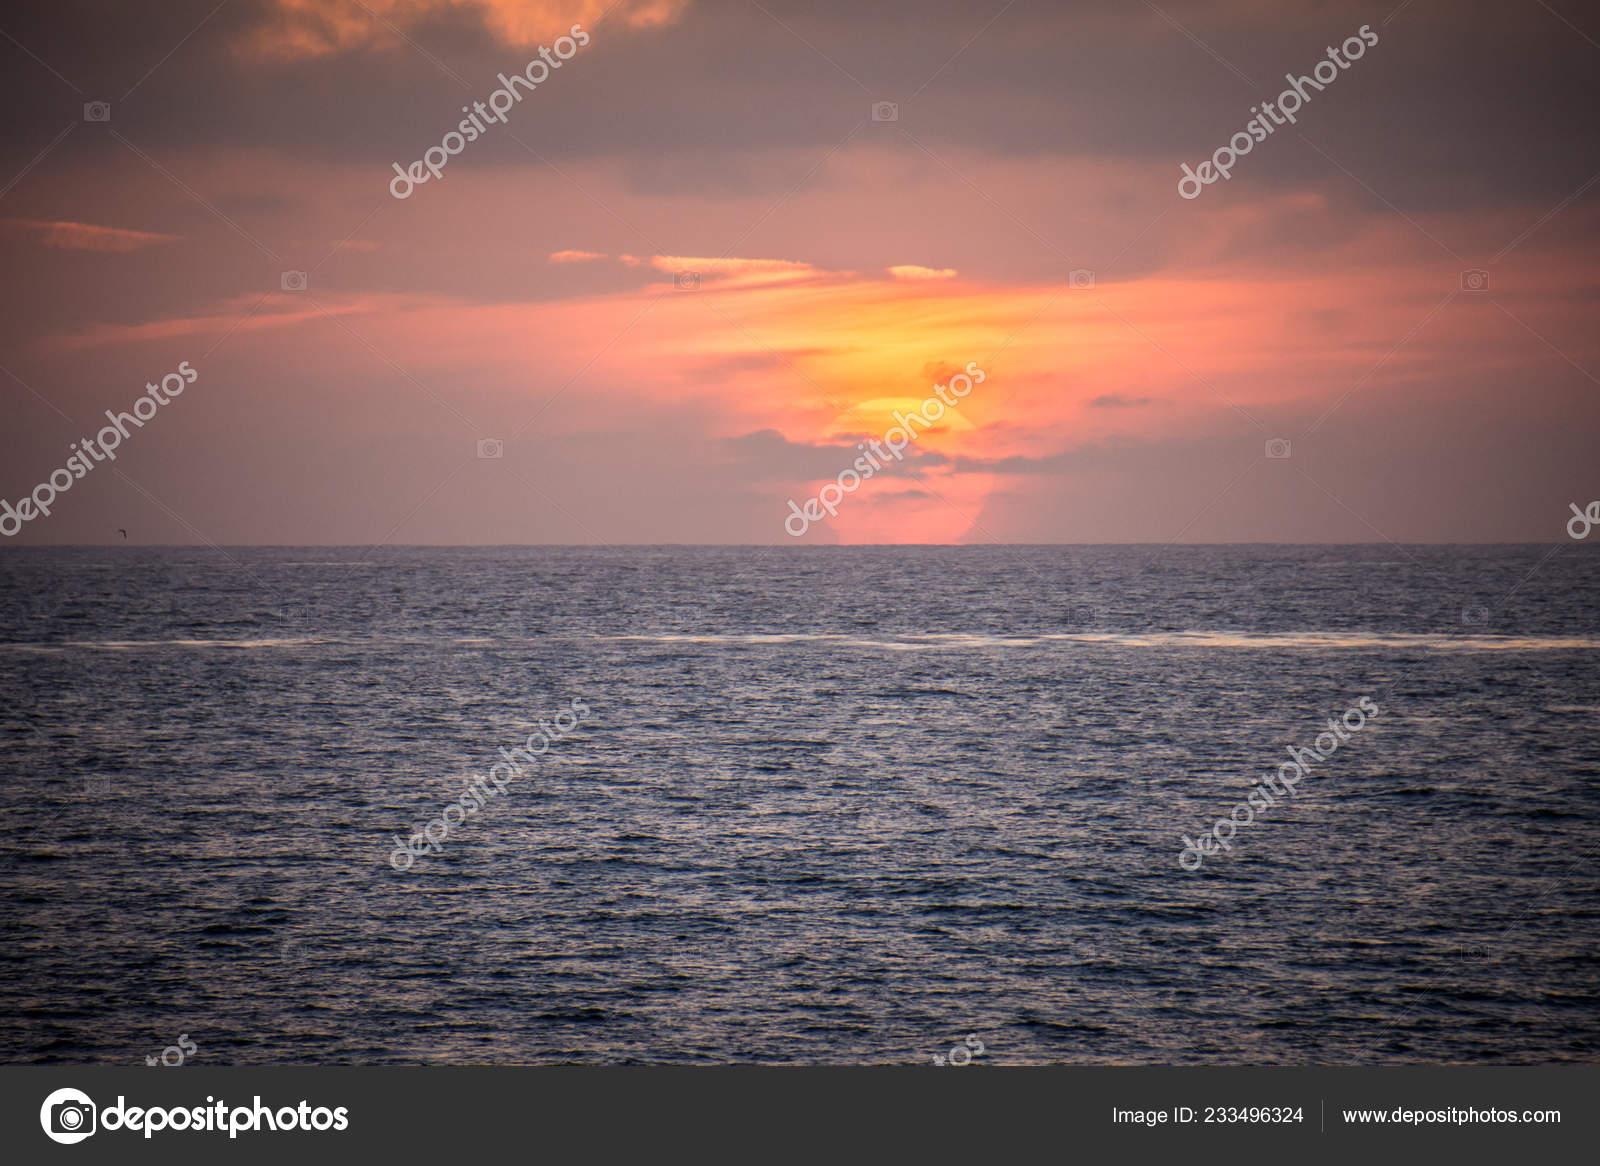 Colorful Orange Purple Sunset Pacific Ocean Jolla San Diego California Stock Photo C Mkopka 233496324